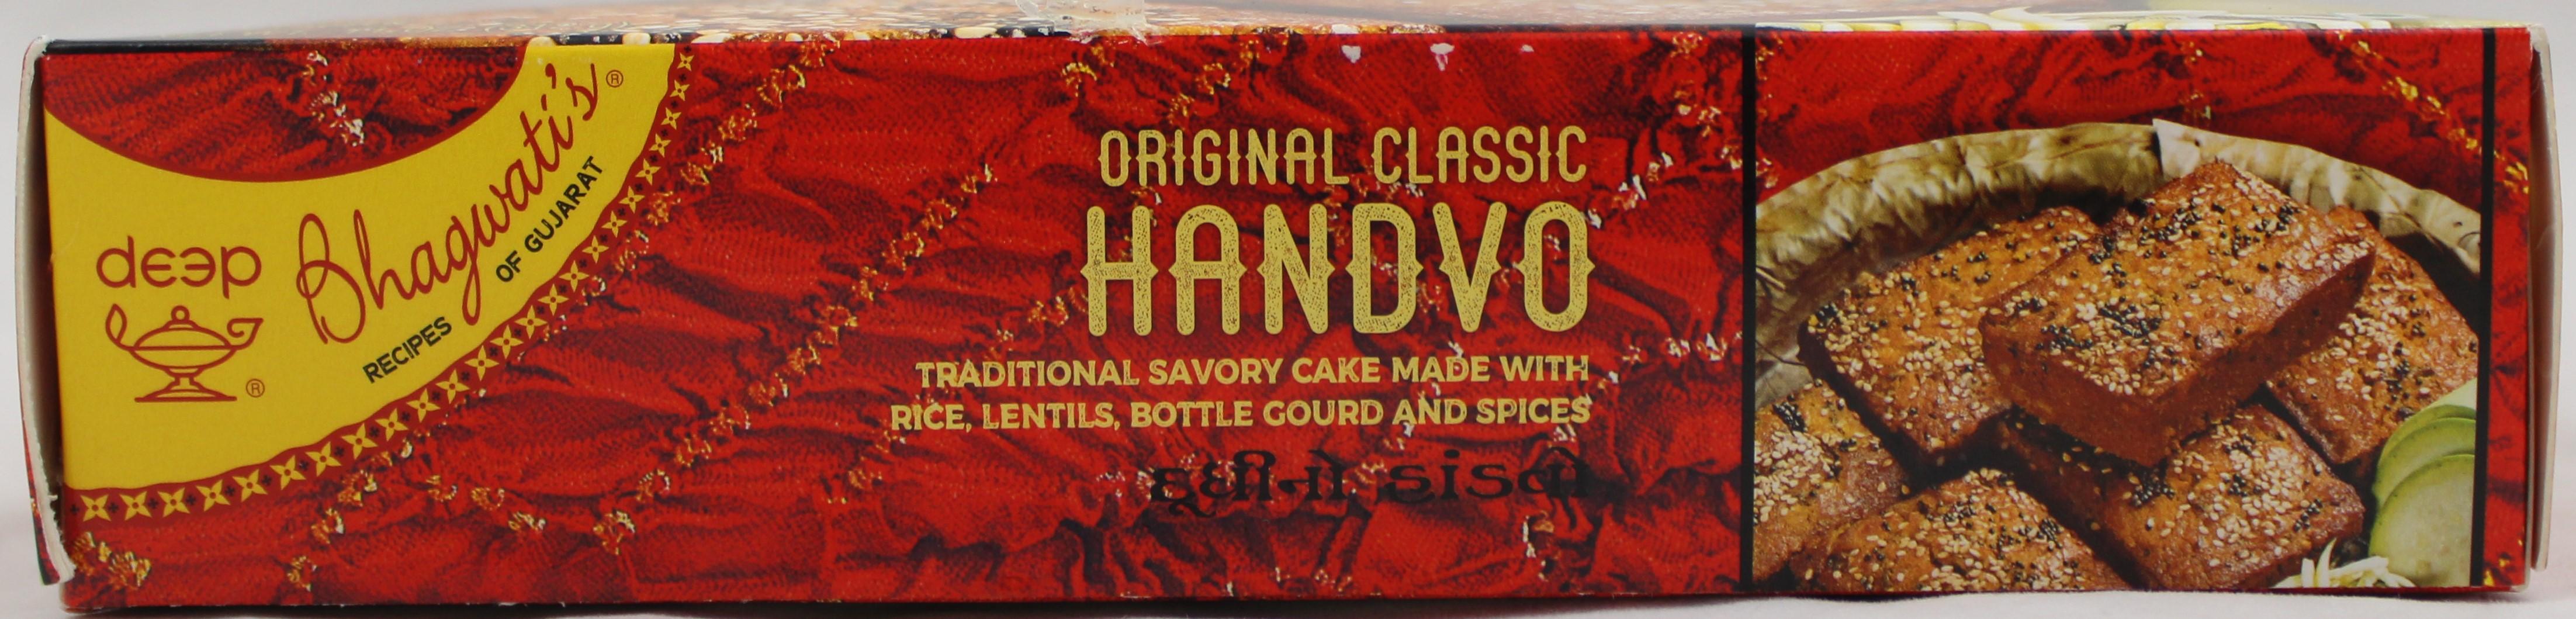 Original Classic Handvo 11oz